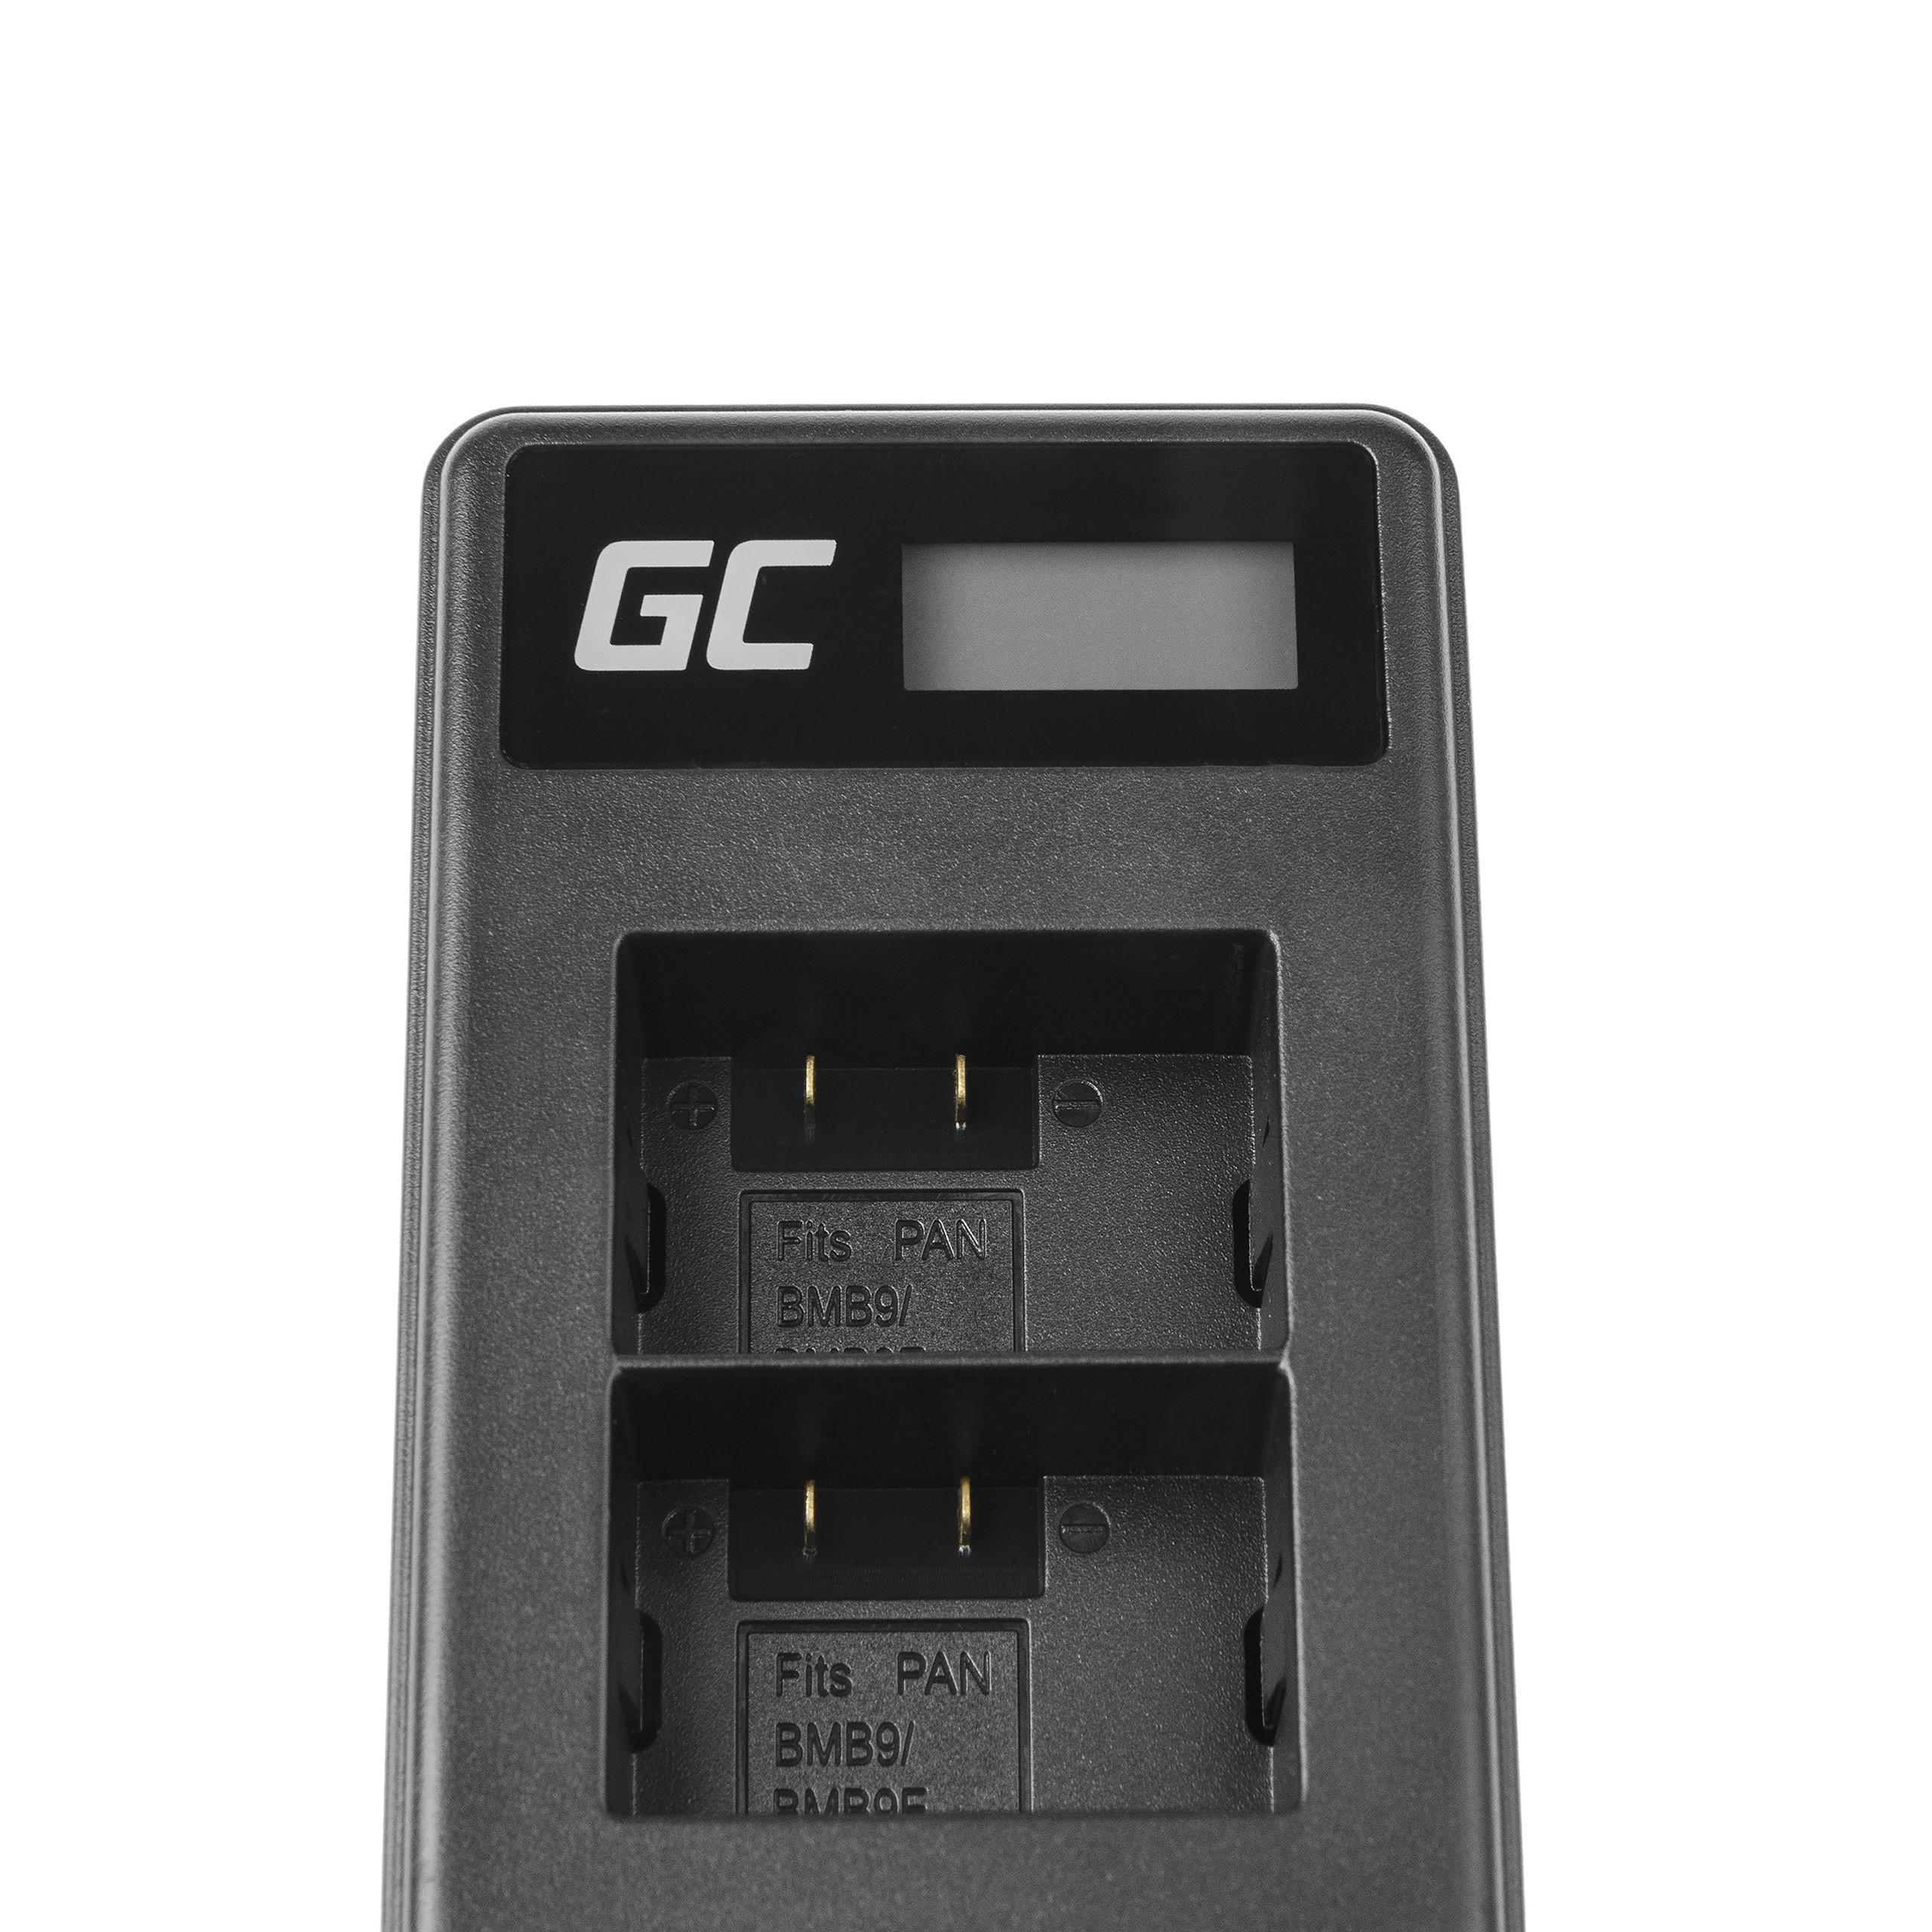 Green Cell Nabíječka DE-A83, DE-A84 pro Panasonic DMW-MBM9, Lumix DMC-FZ70, DMC-FZ60, DMC-FZ100, DMC-FZ40, DMC-FZ47